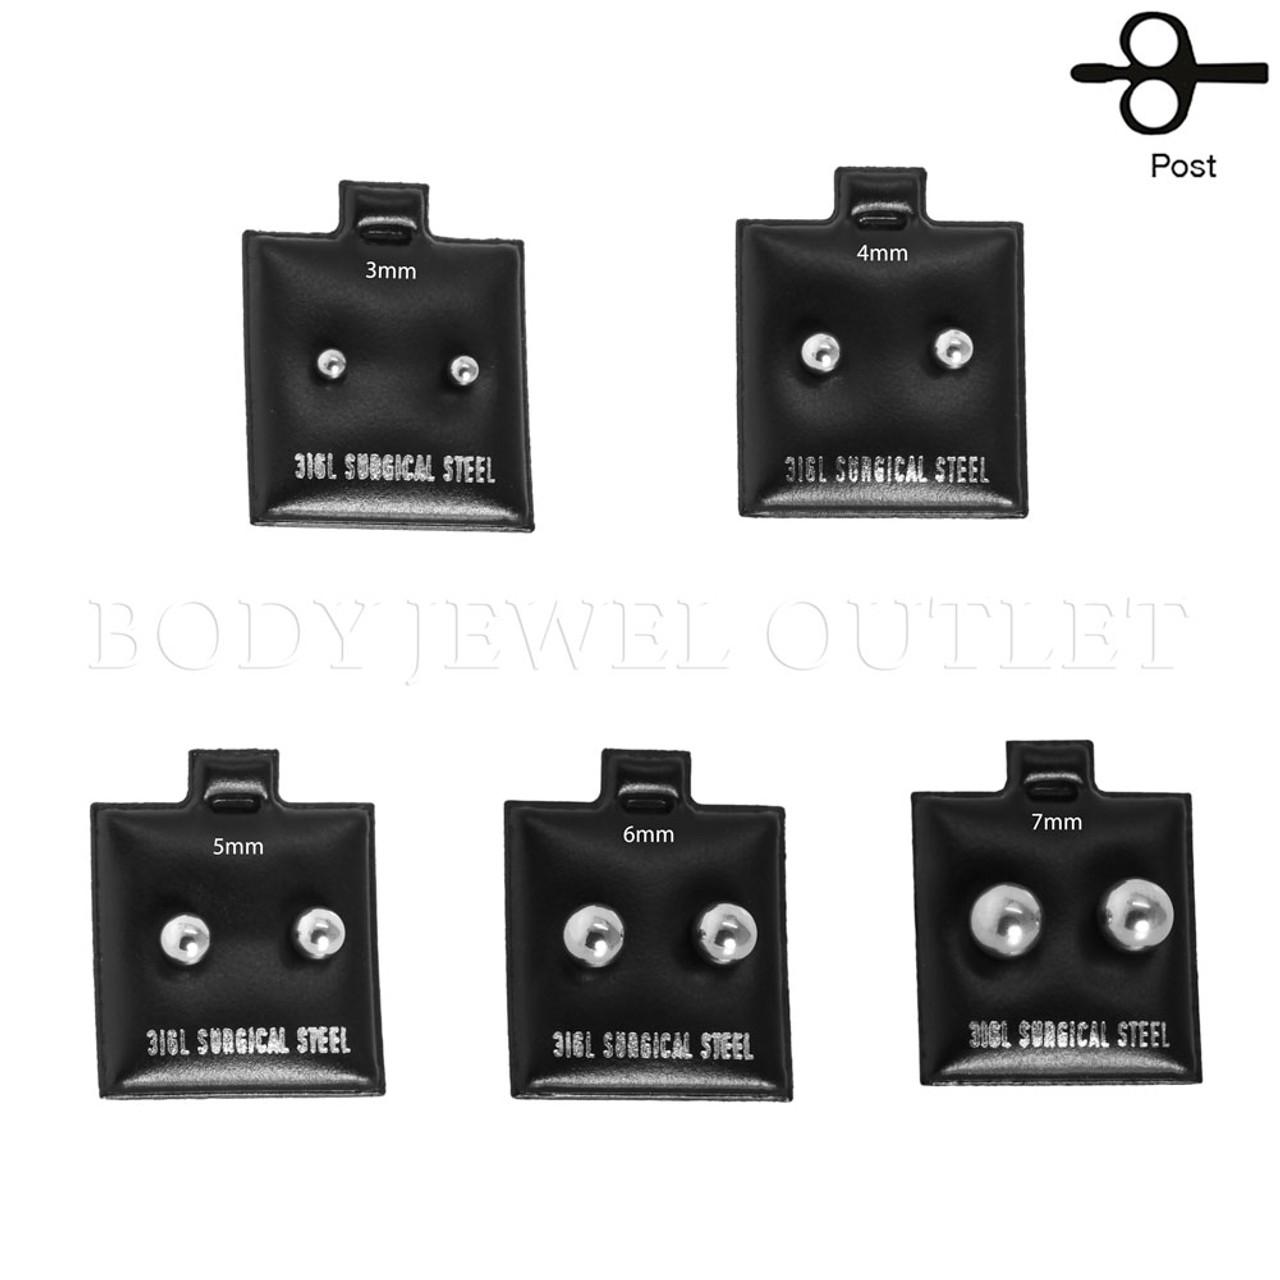 4mm Stud Earrings Stainless Steel Ball   BodyJewelOutlet